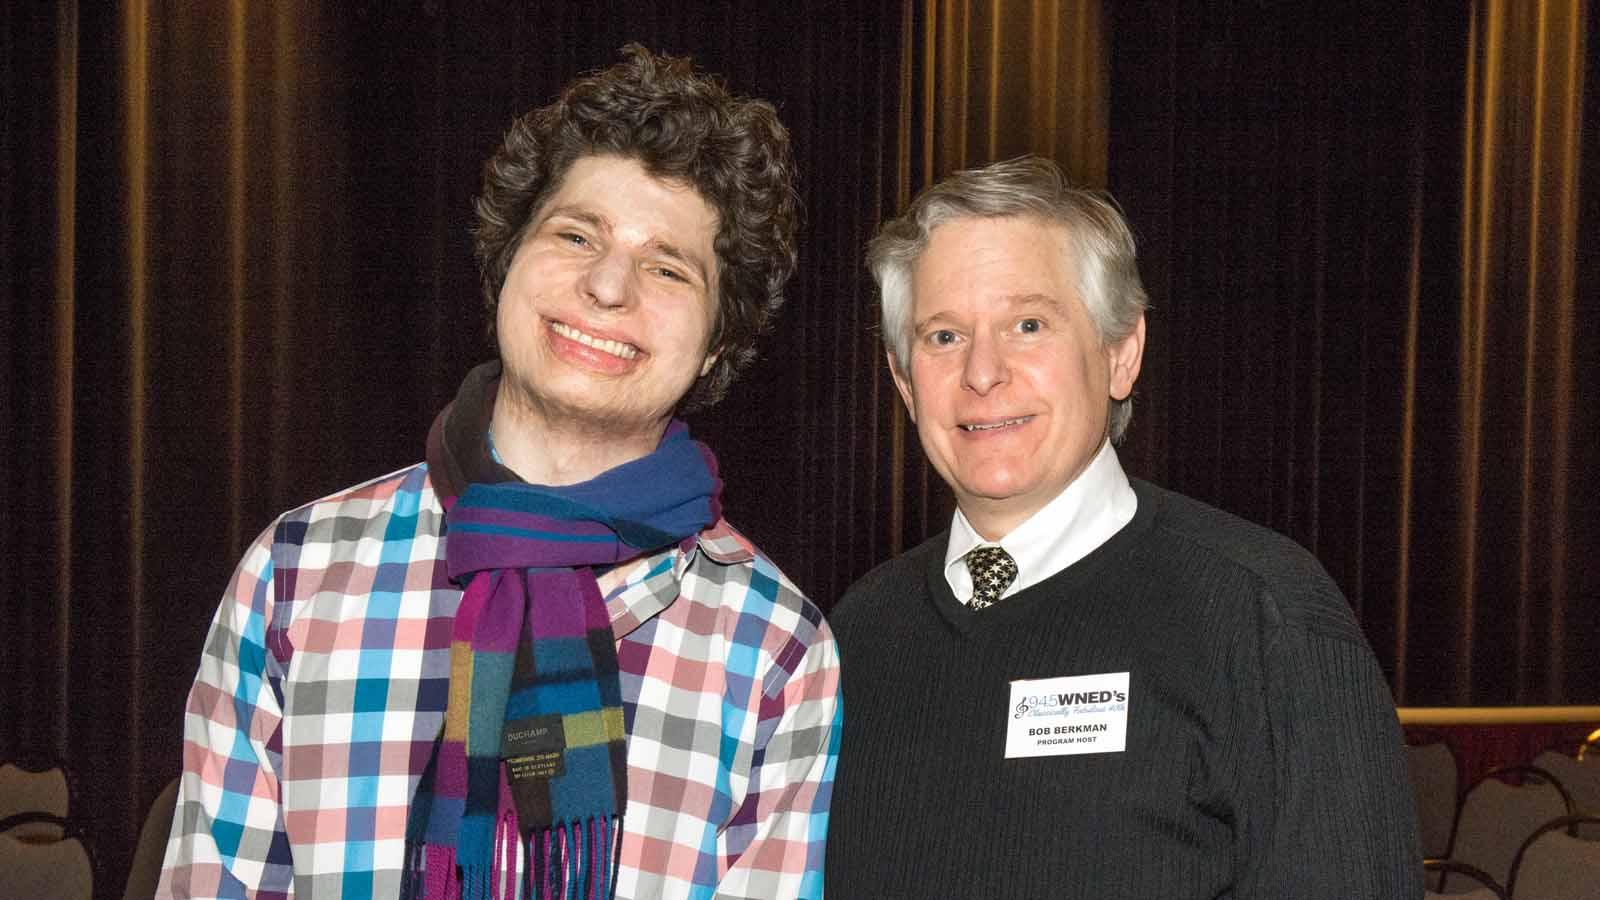 Augustin Hadelich_and Bob Berkman